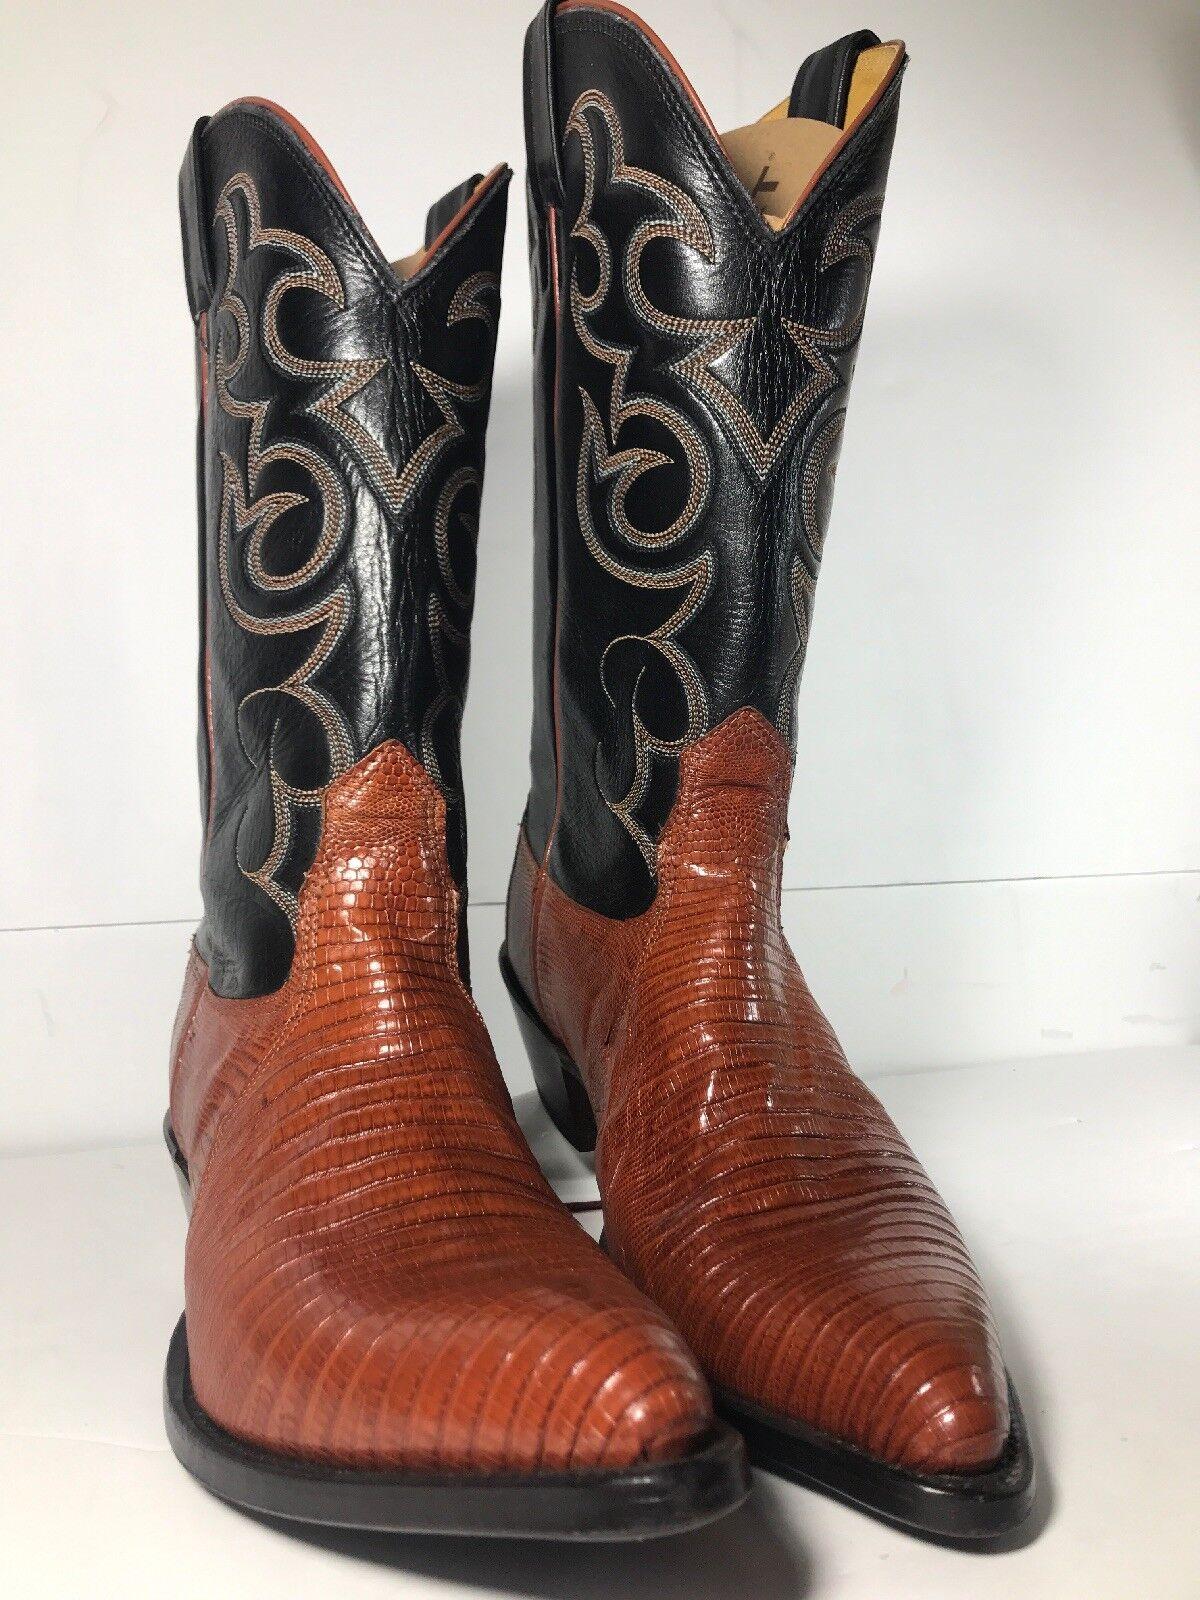 gli ultimi modelli Nocona donna Western stivali 1524-27-305 Peanut Peanut Peanut Brittle Lizard Leather Dimensione 8.5B  presa di fabbrica